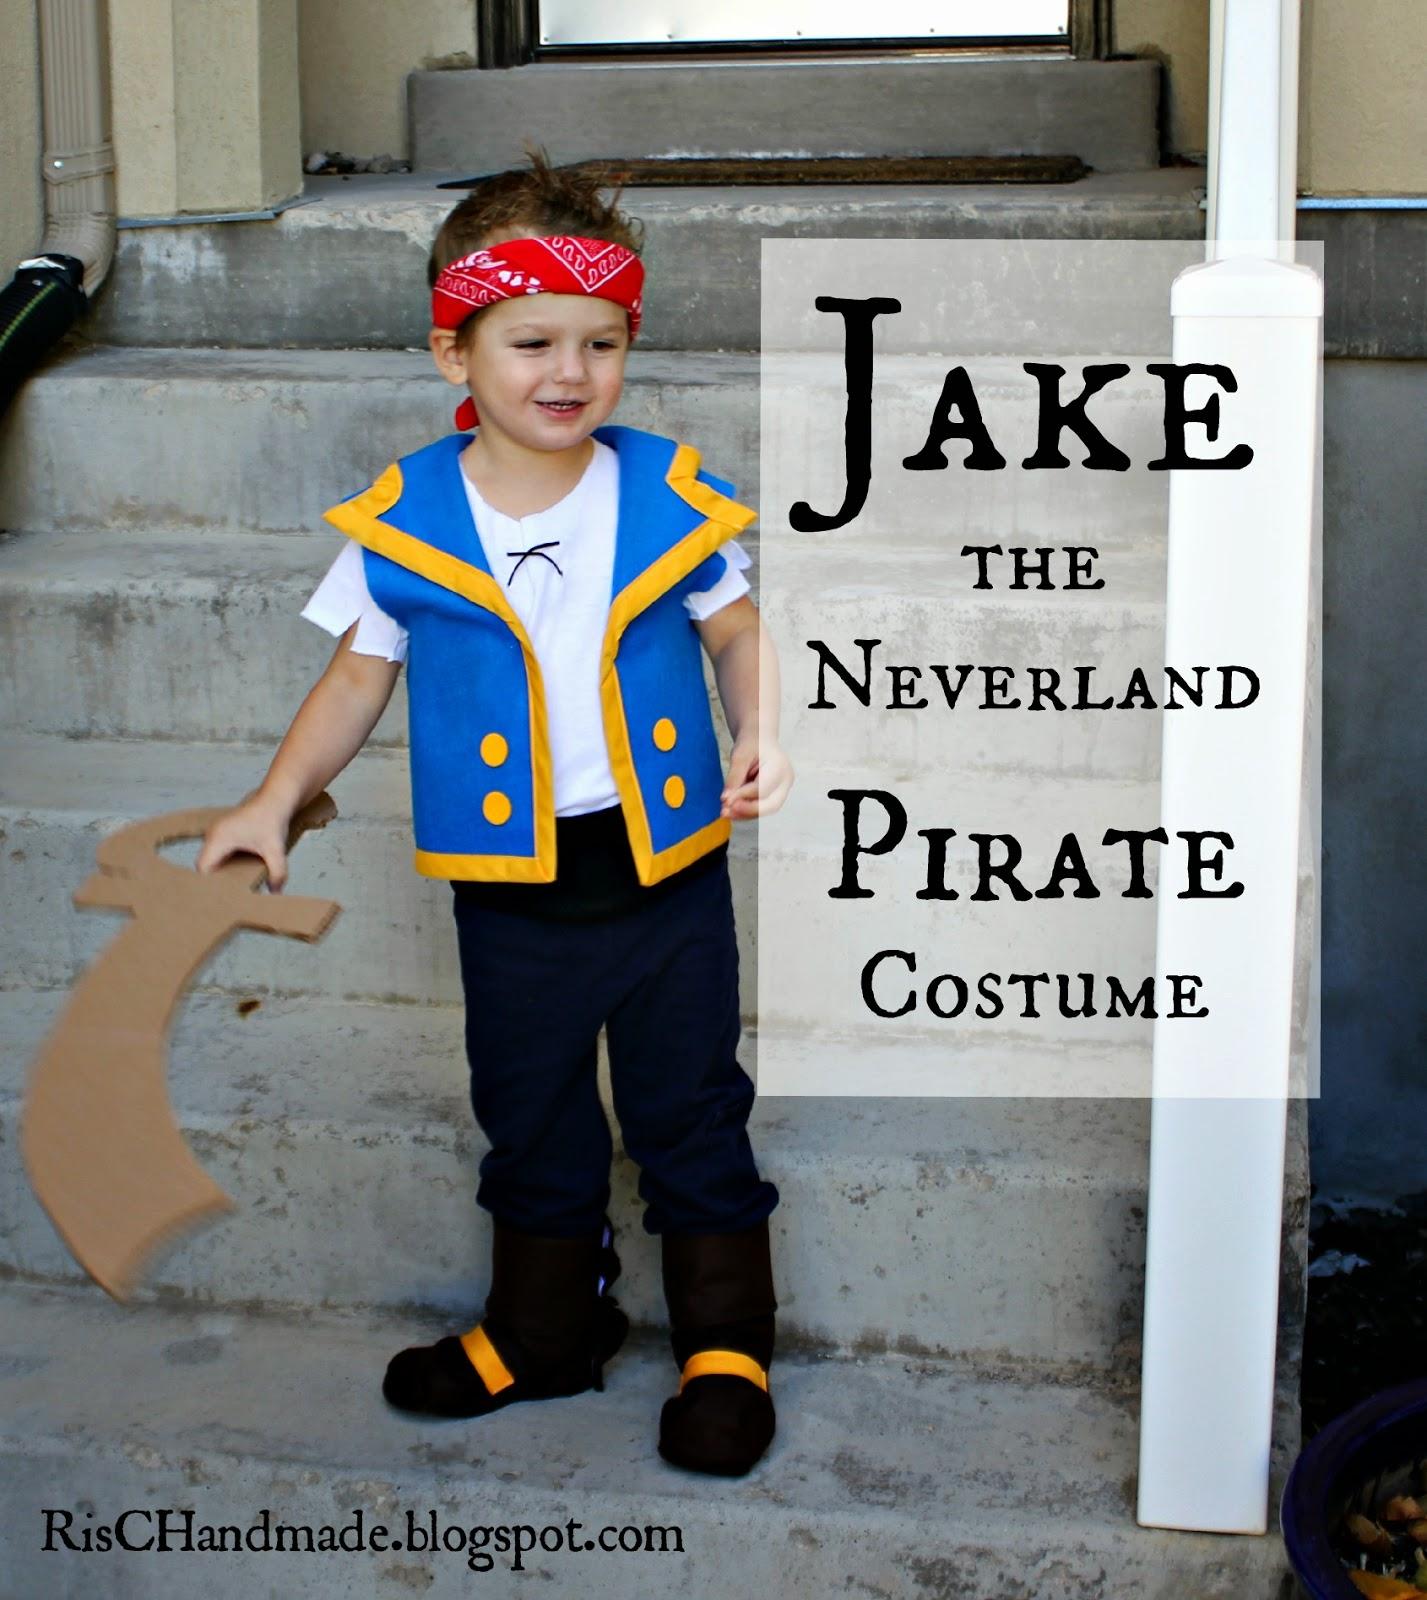 Jake the Neverland Pirate Costume  sc 1 th 238 & RisC Handmade